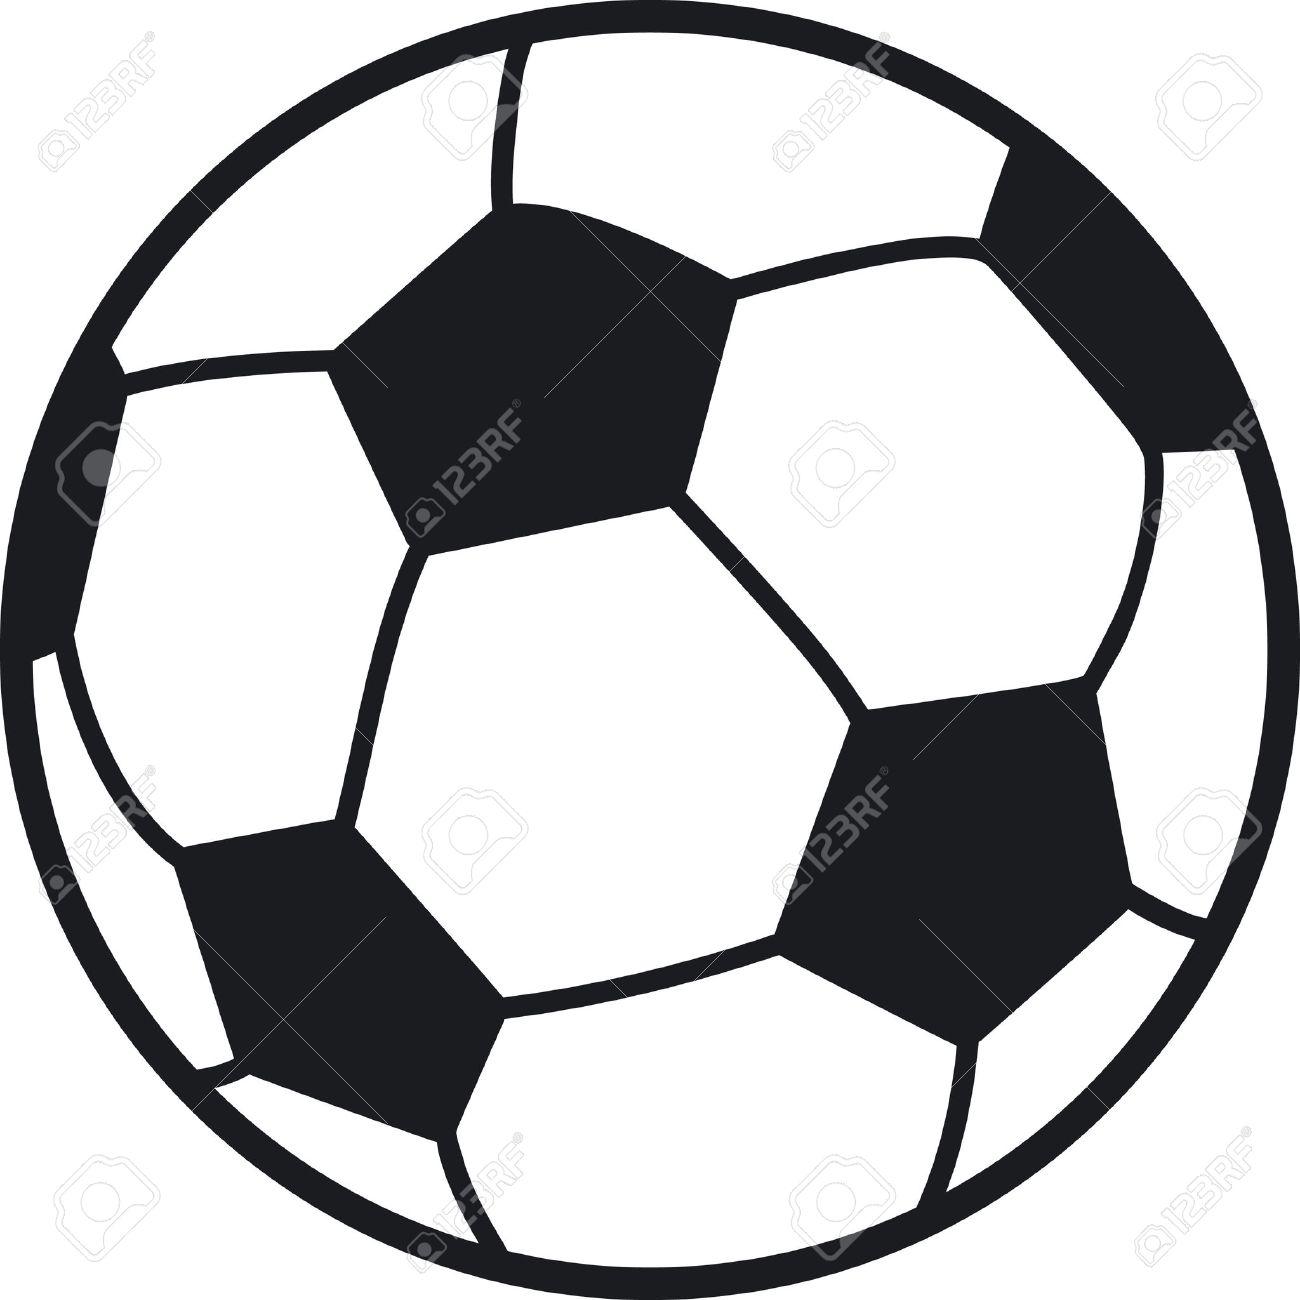 soccer ball royalty free cliparts vectors and stock illustration rh 123rf com soccer victorian trade card soccer vector free